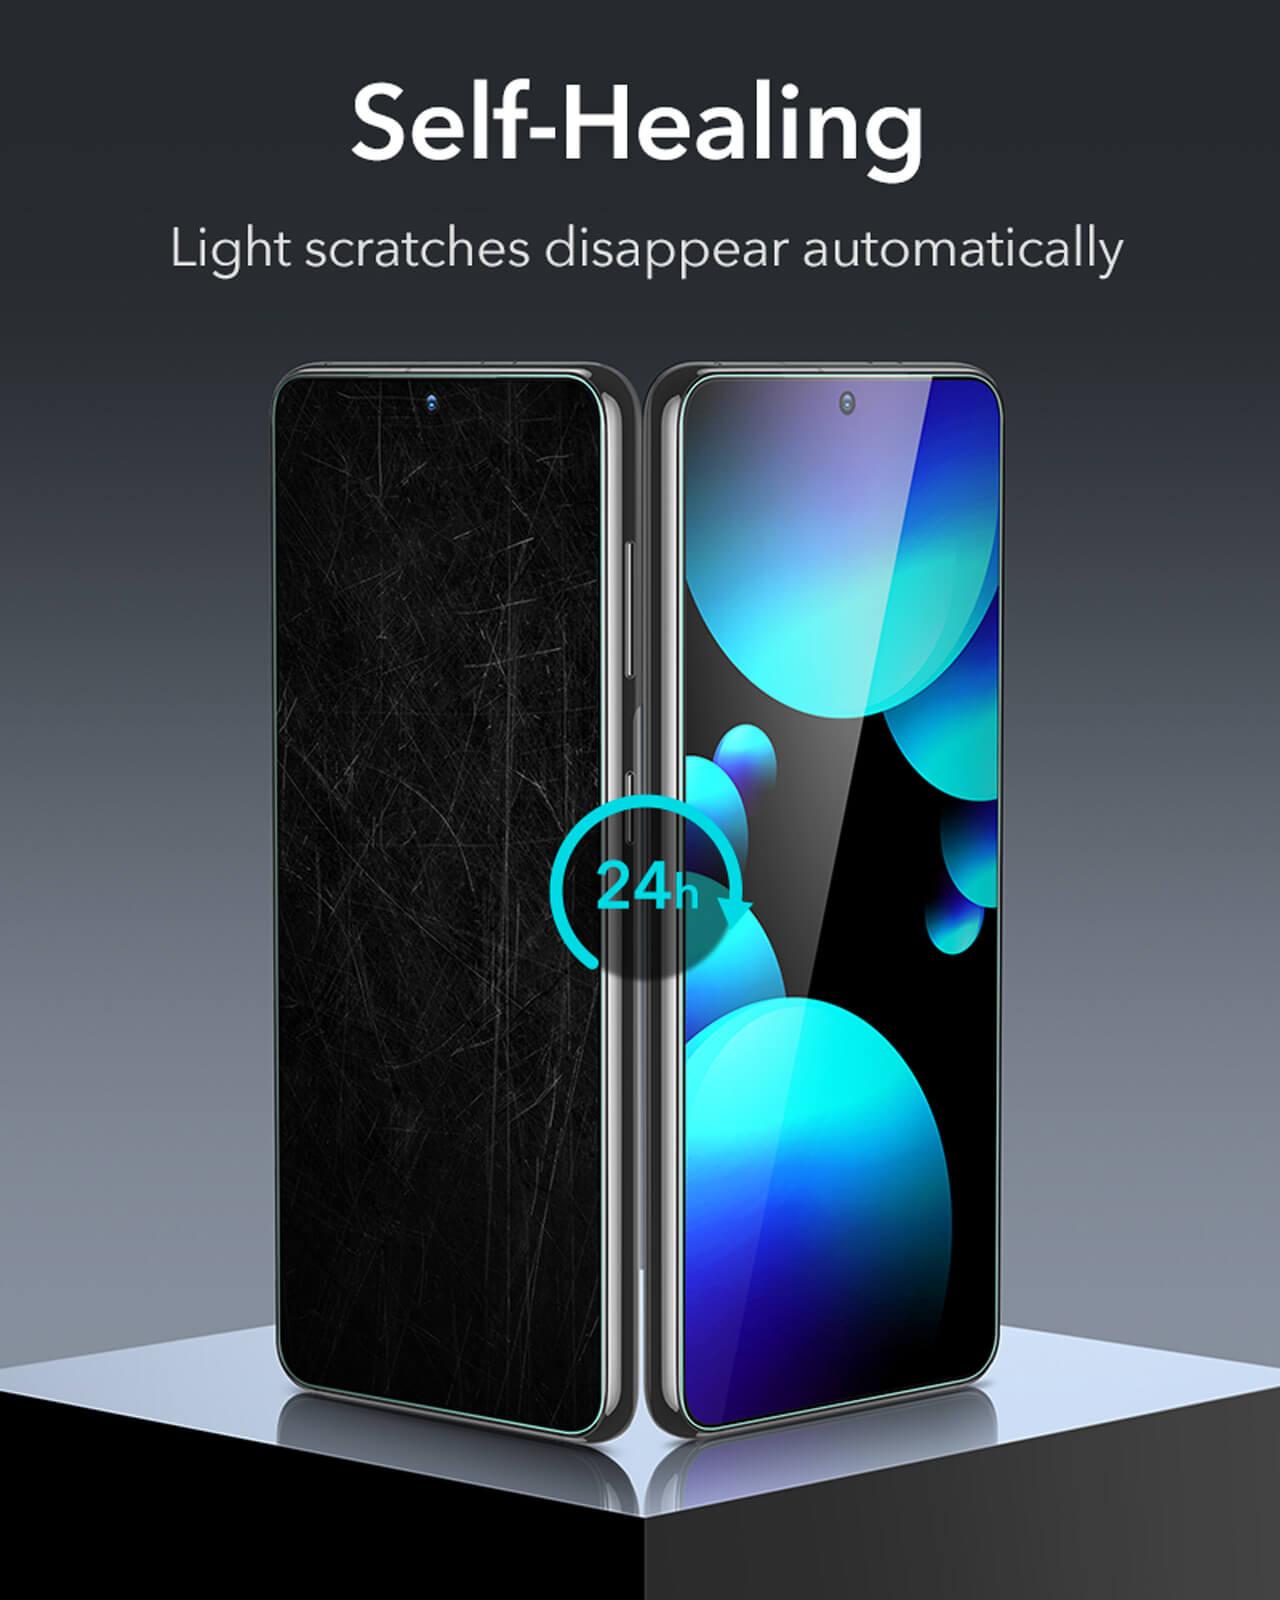 Galaxy S21 Liquid Skin Full Coverage Screen Protector 1 1